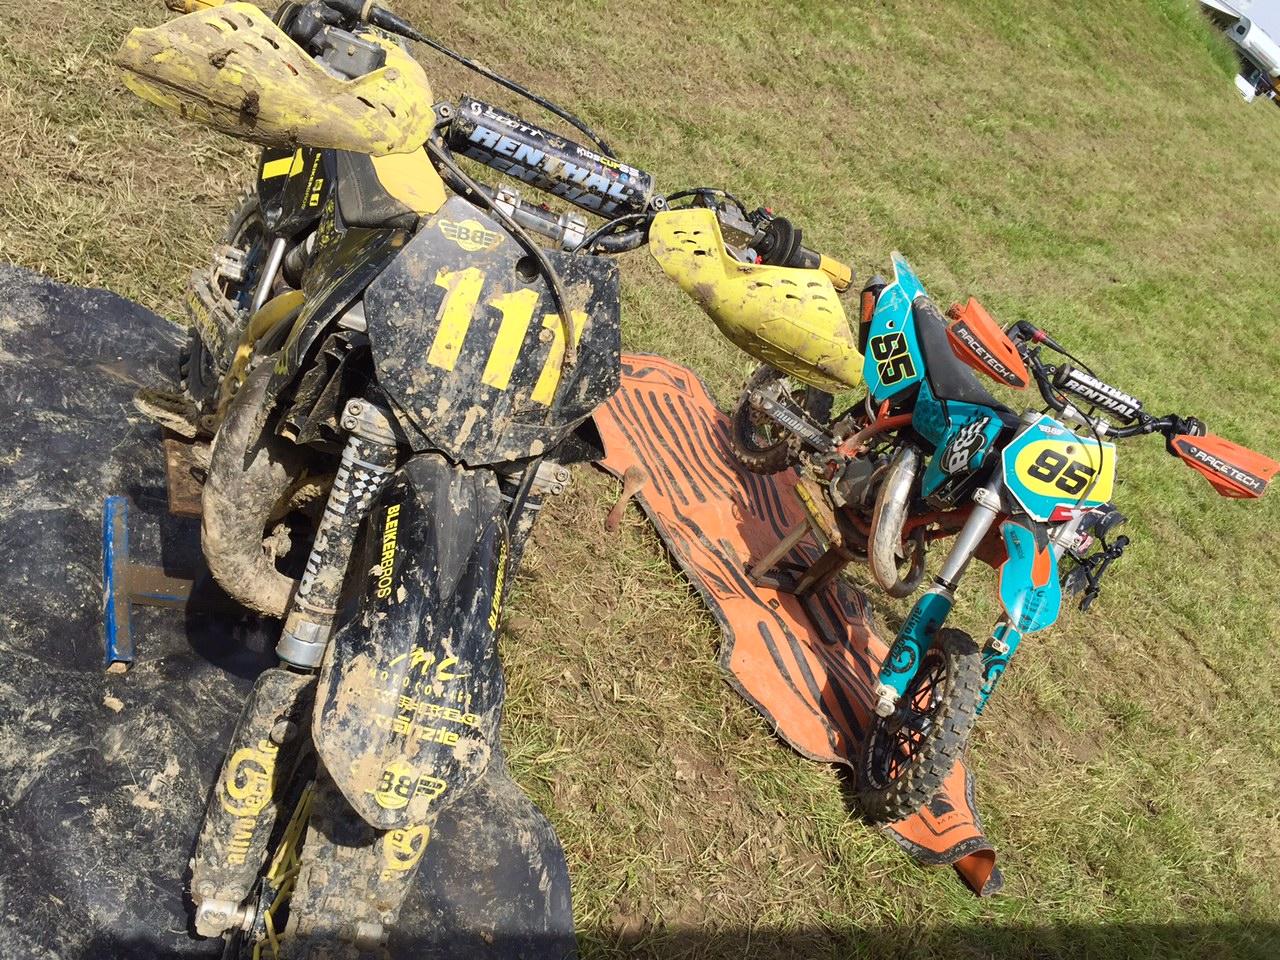 dreckige MX Motos